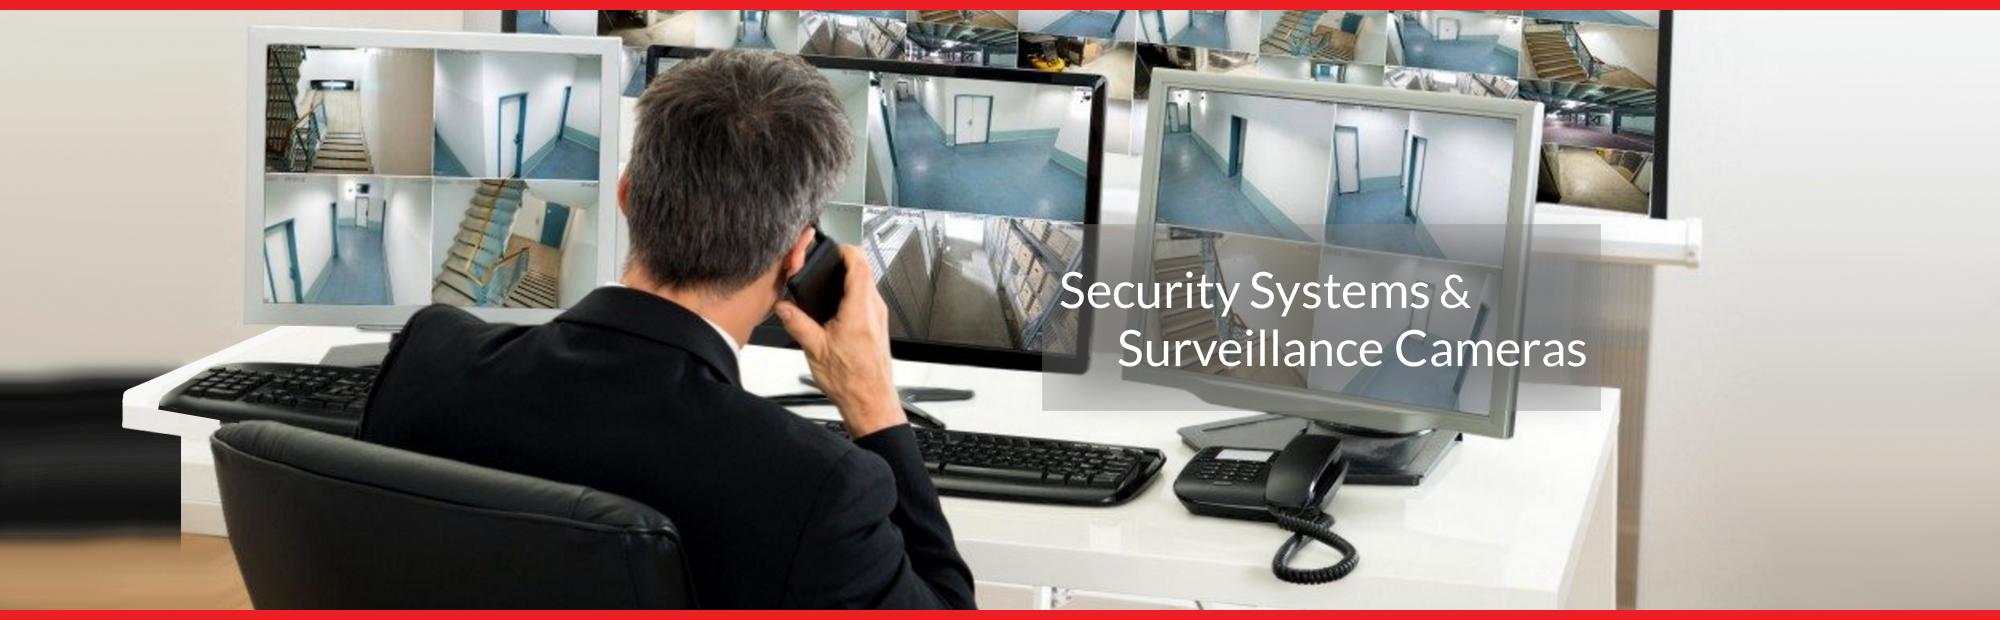 Security Cameras & Surveillance Systems